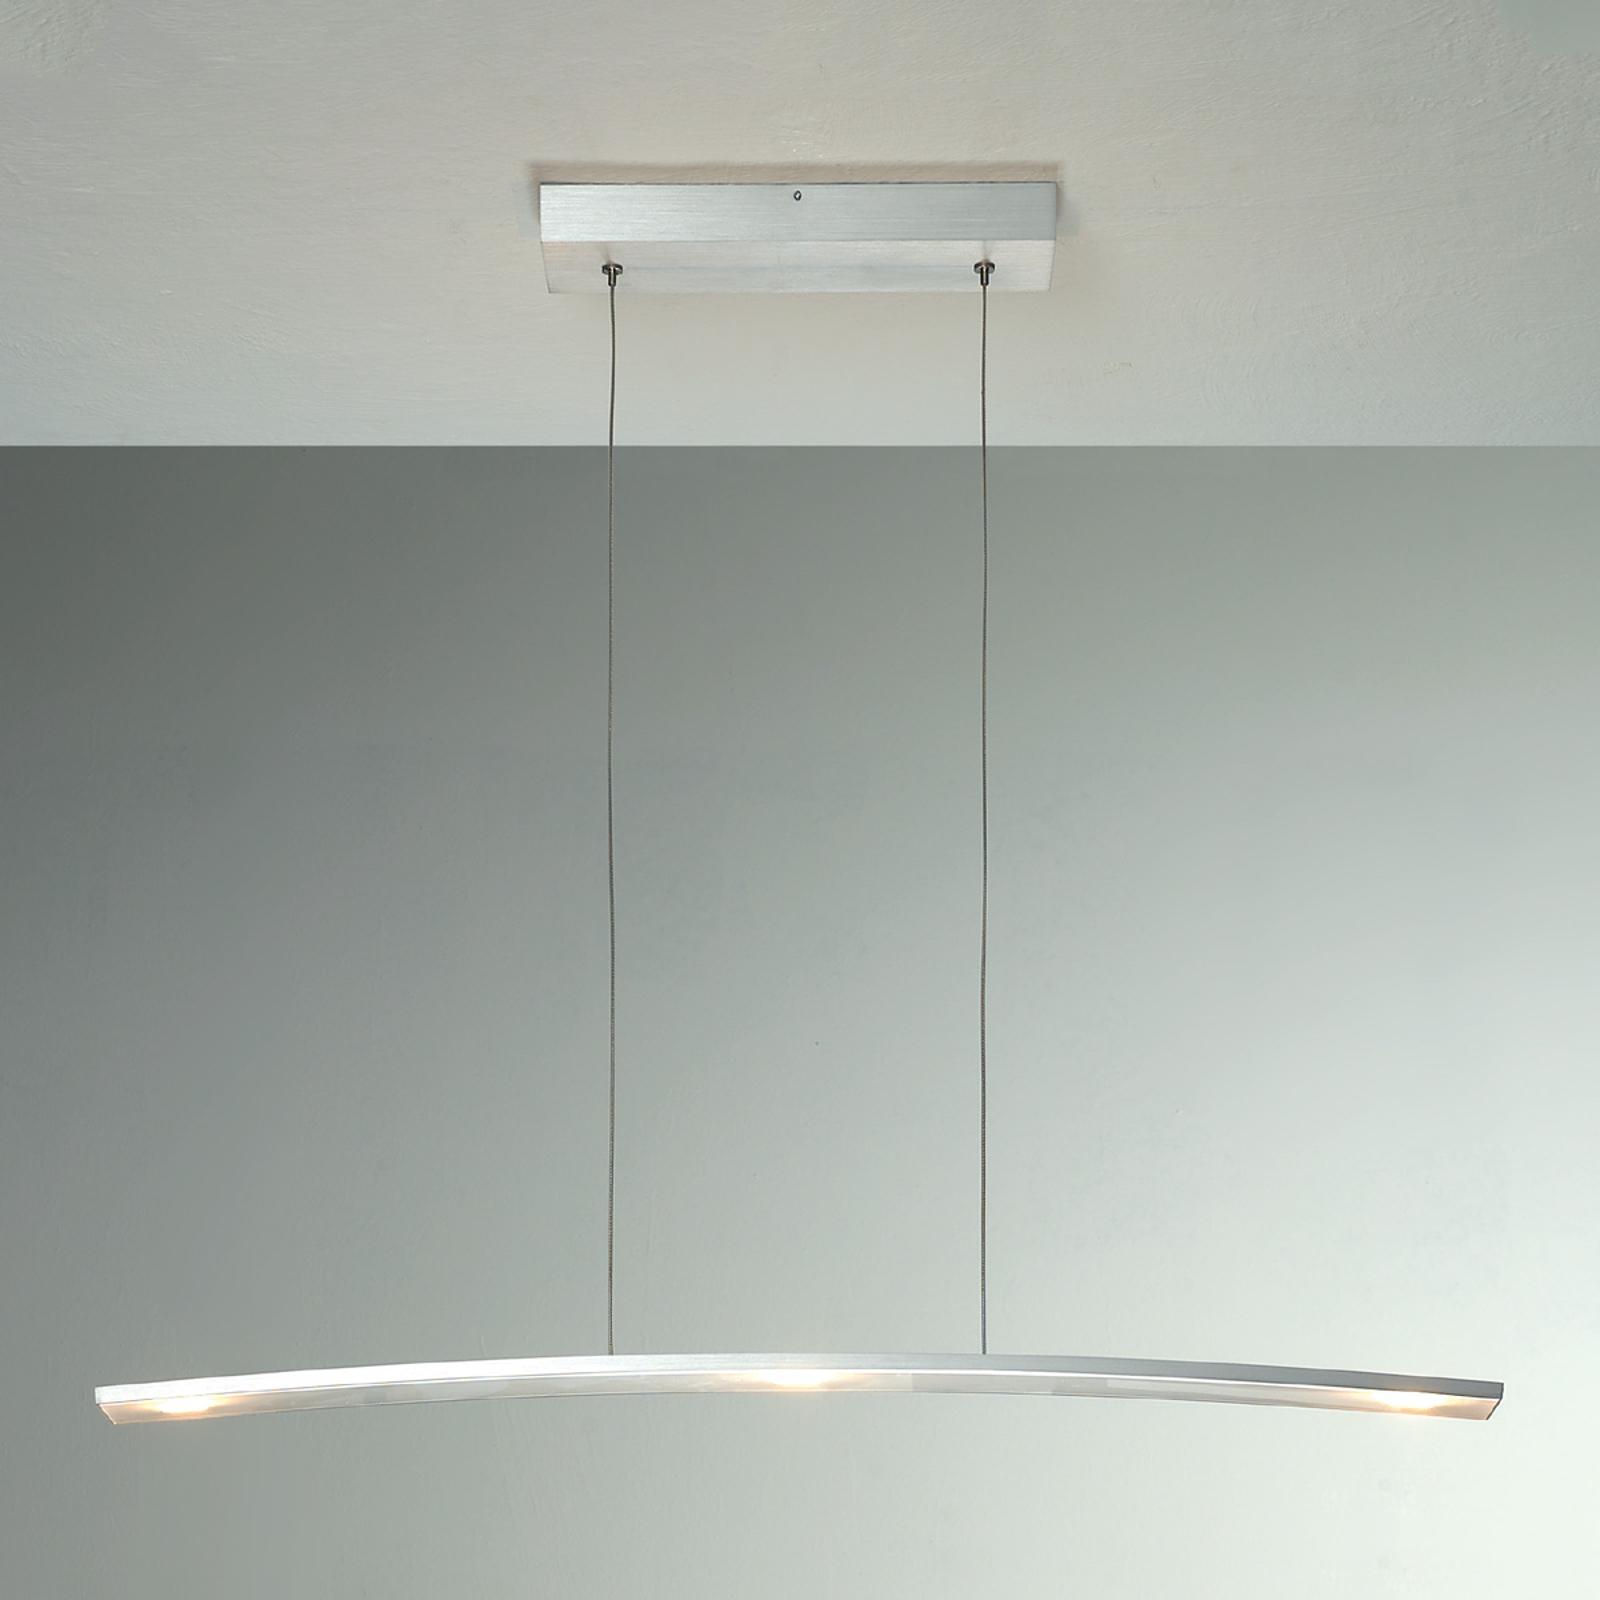 Bopp More závesné LED svietidlo, 100cm_1556036_1